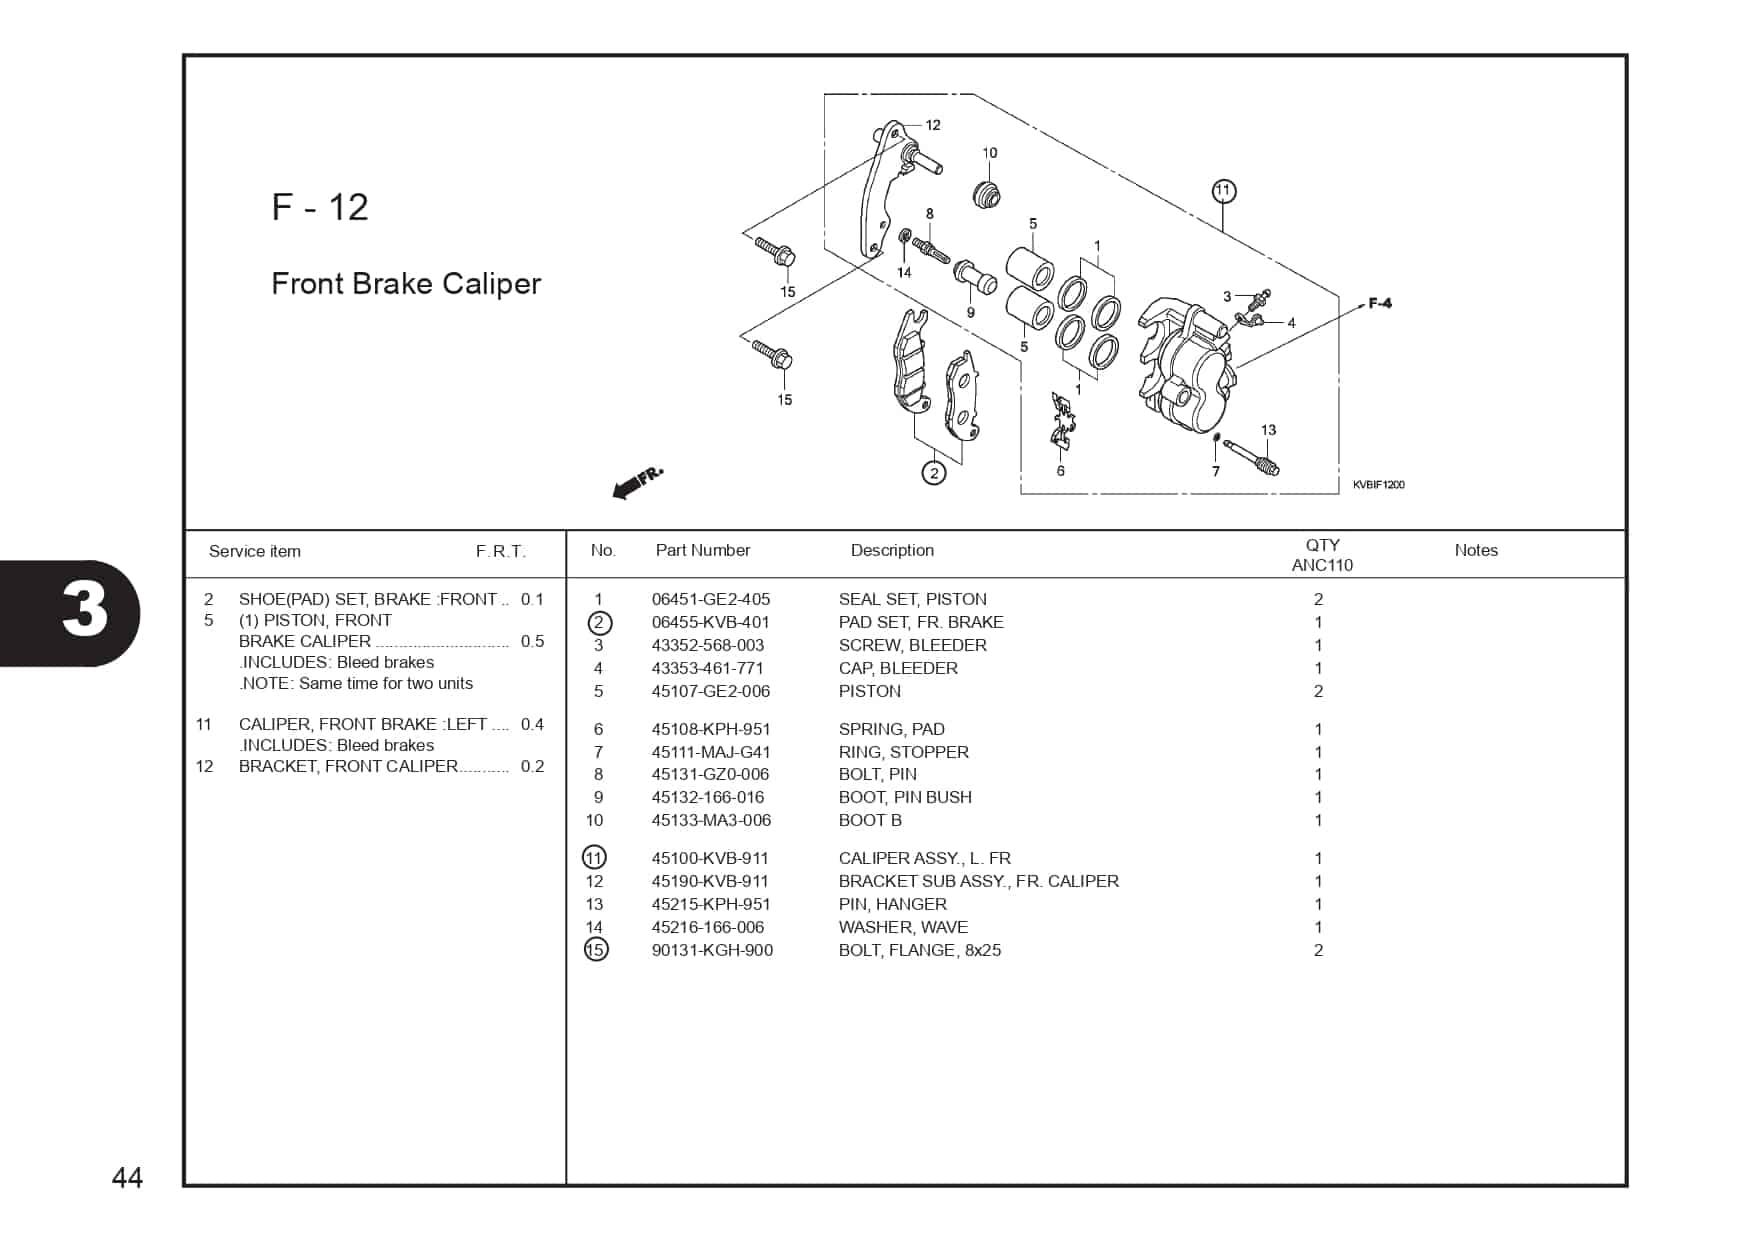 F-12 Front Brake Caliper